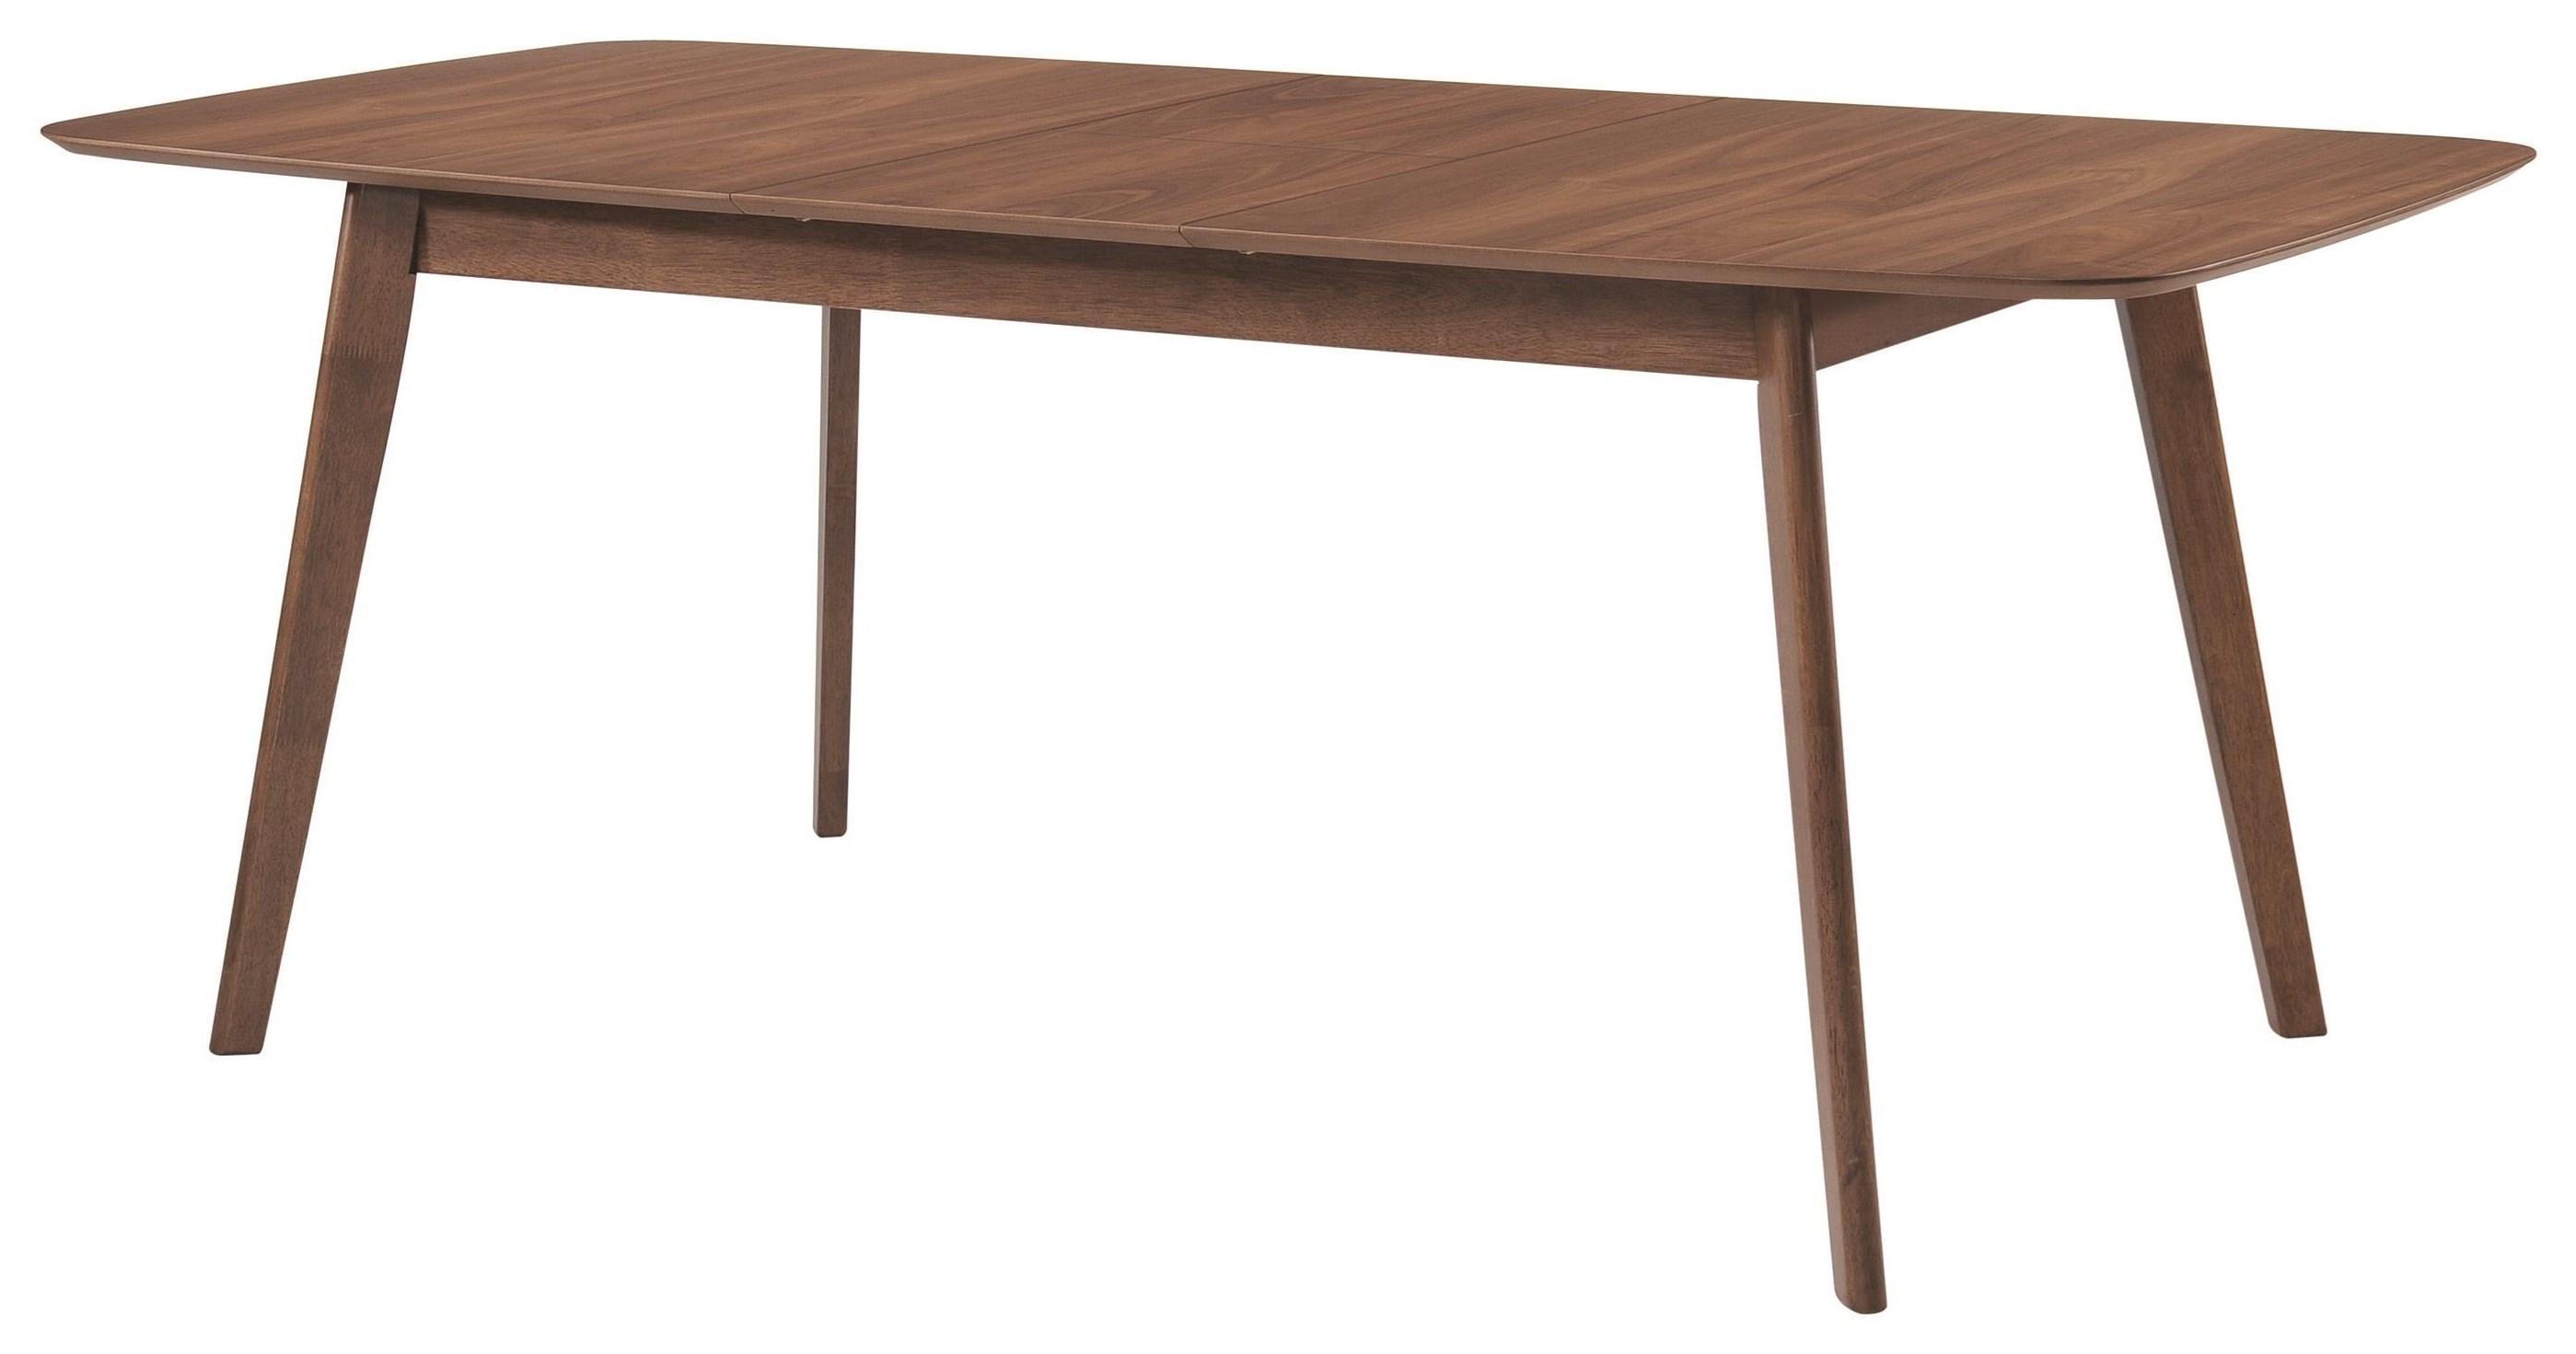 Redbridge Dining Table by Coaster at HomeWorld Furniture